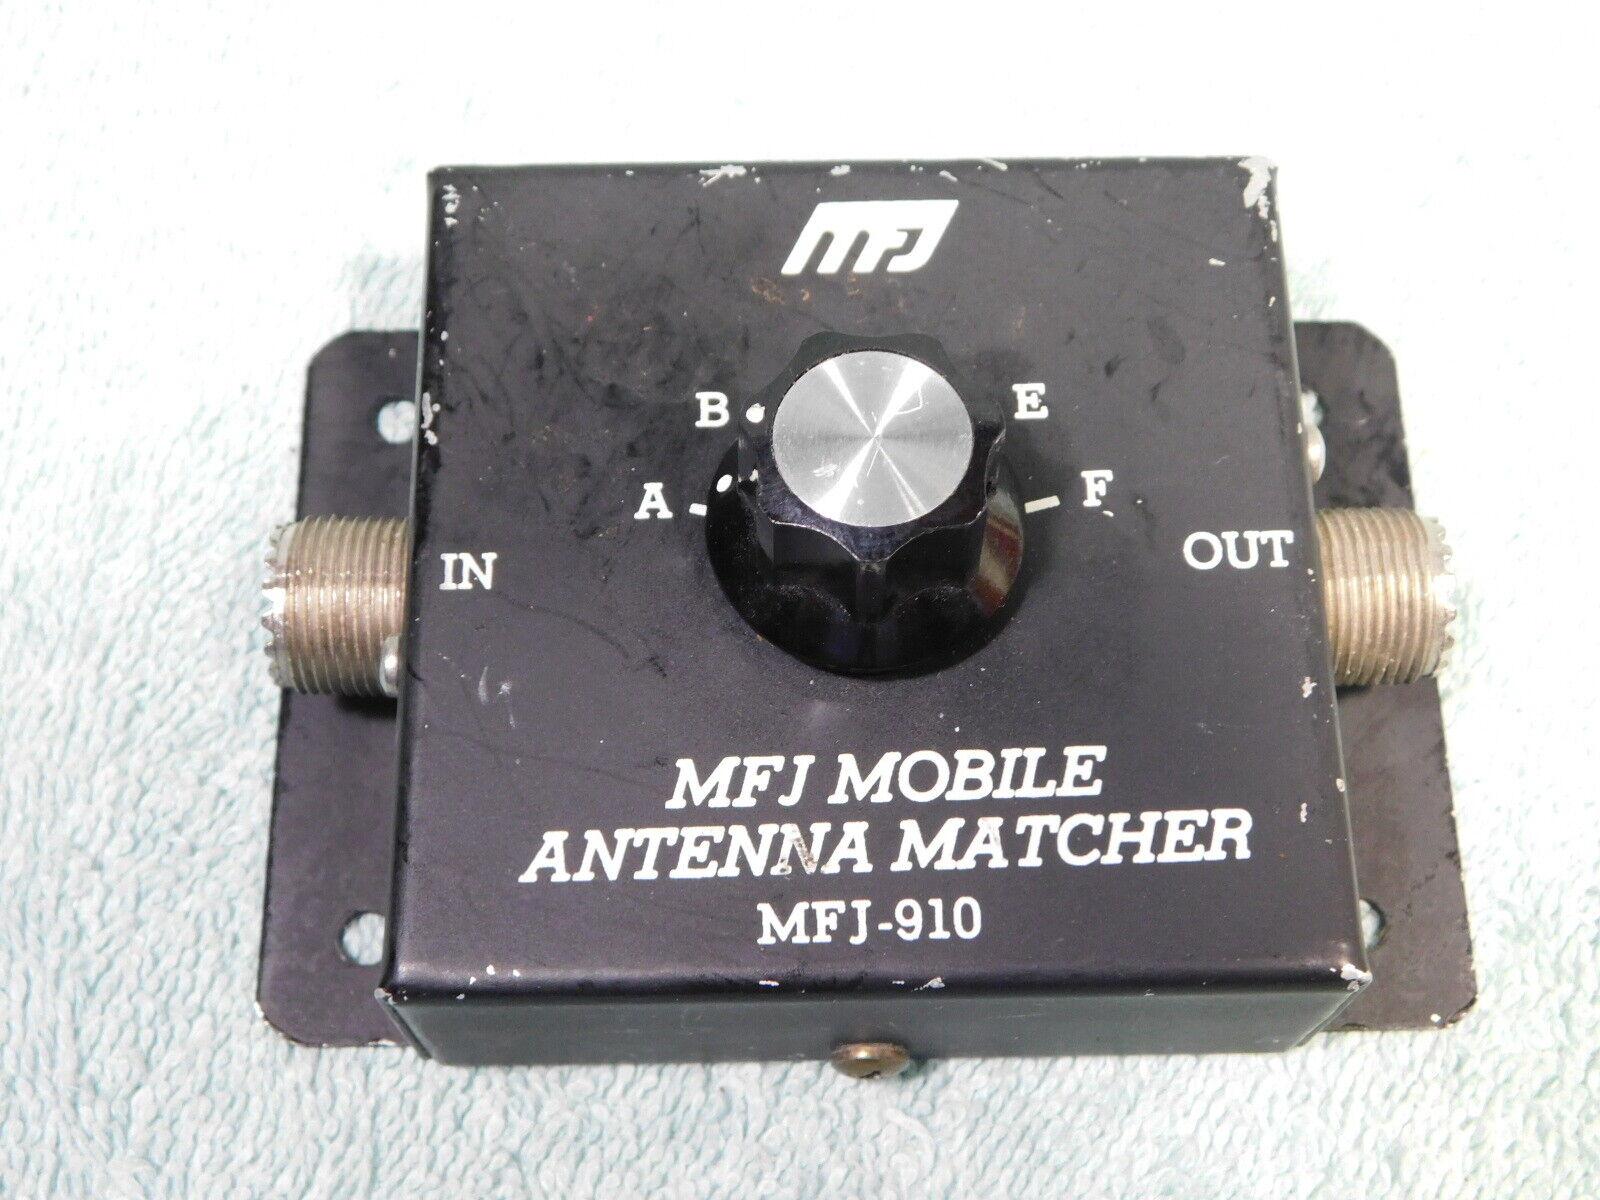 Used 🔥 MFJ-910 200 WATT MOBILE ANTENNA MATCHER FOR SWR FIX / HAM RADIO 50 OHM.